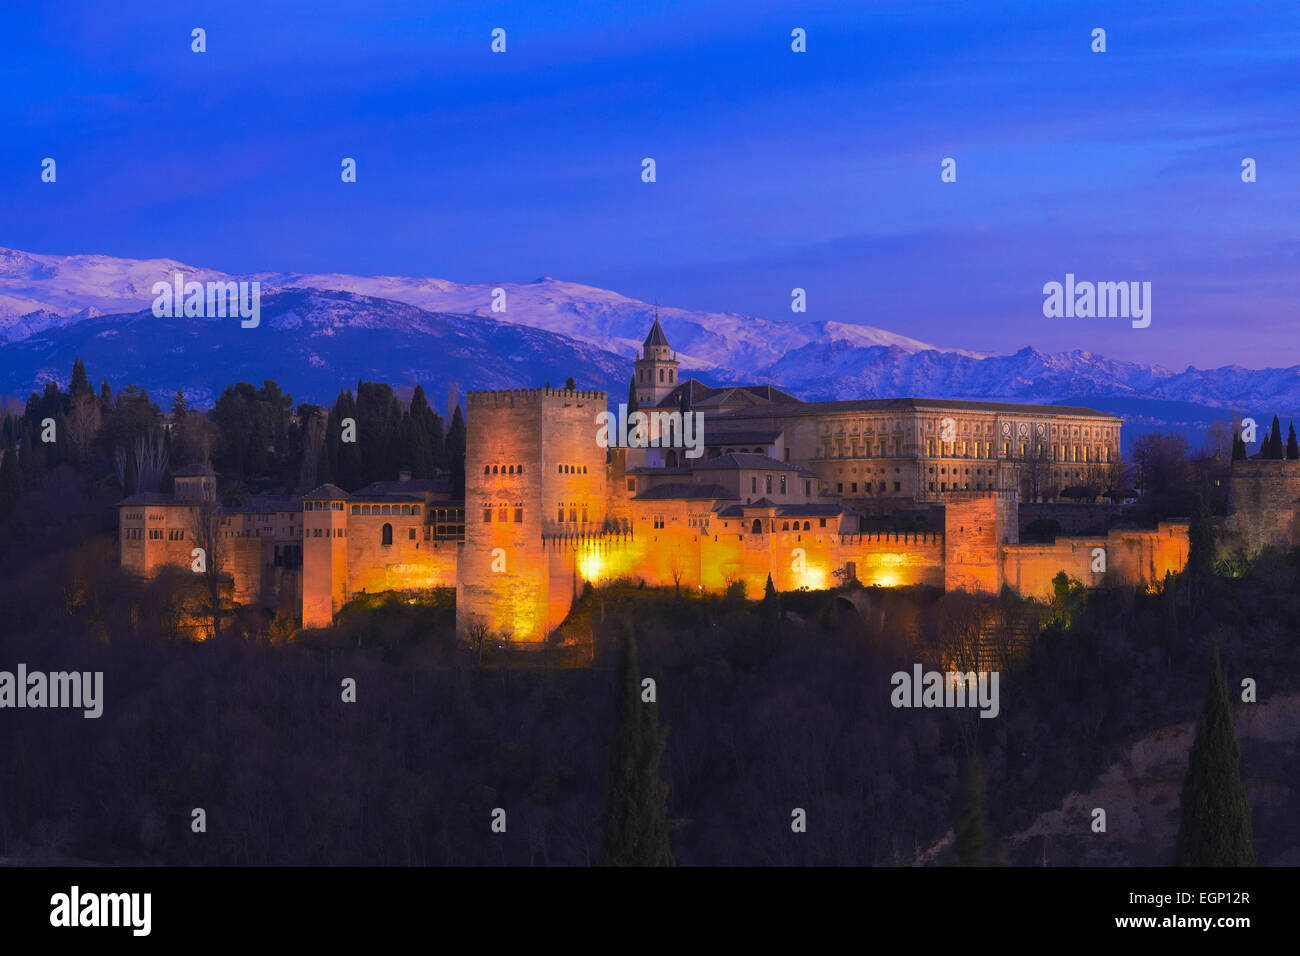 Alhambra, UNESCO World Heritage Site, Sierra Nevada and la Alhambra at Dusk, Granada, Andalusia, Spain - Stock Image